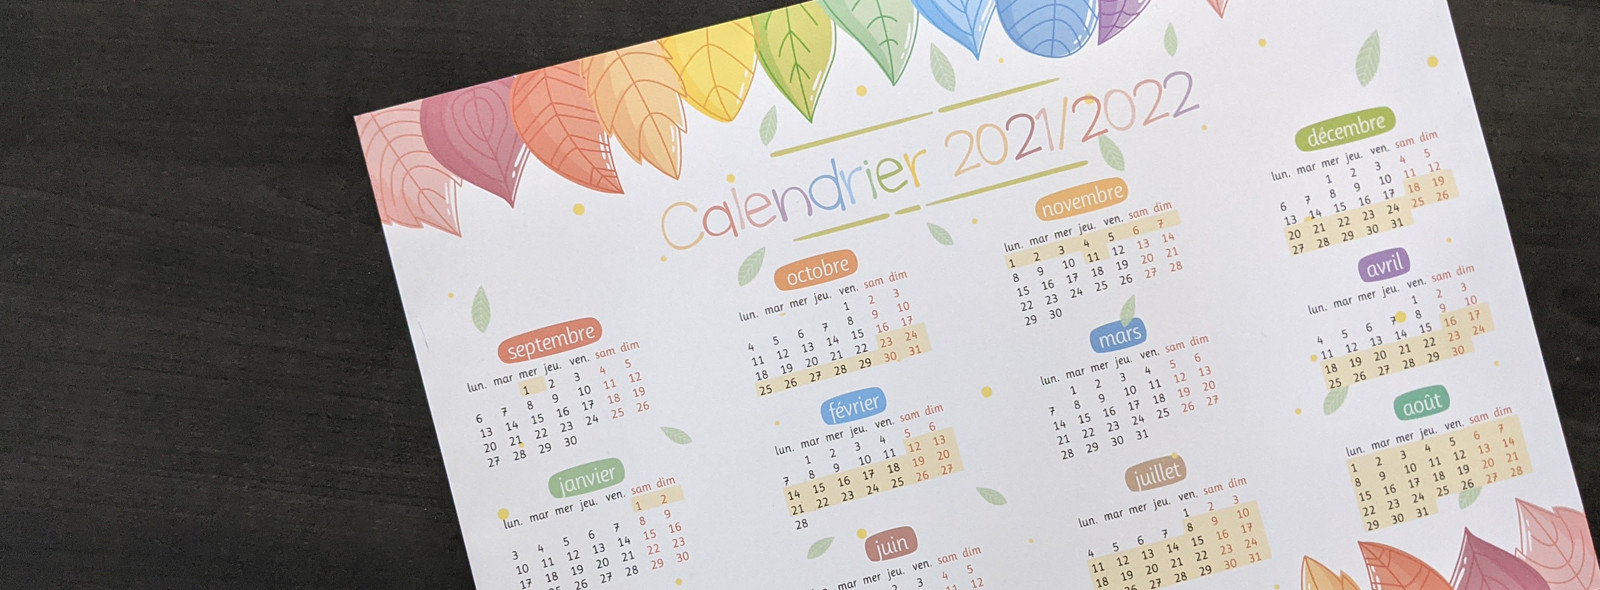 Calendrier annuel 2021/2022